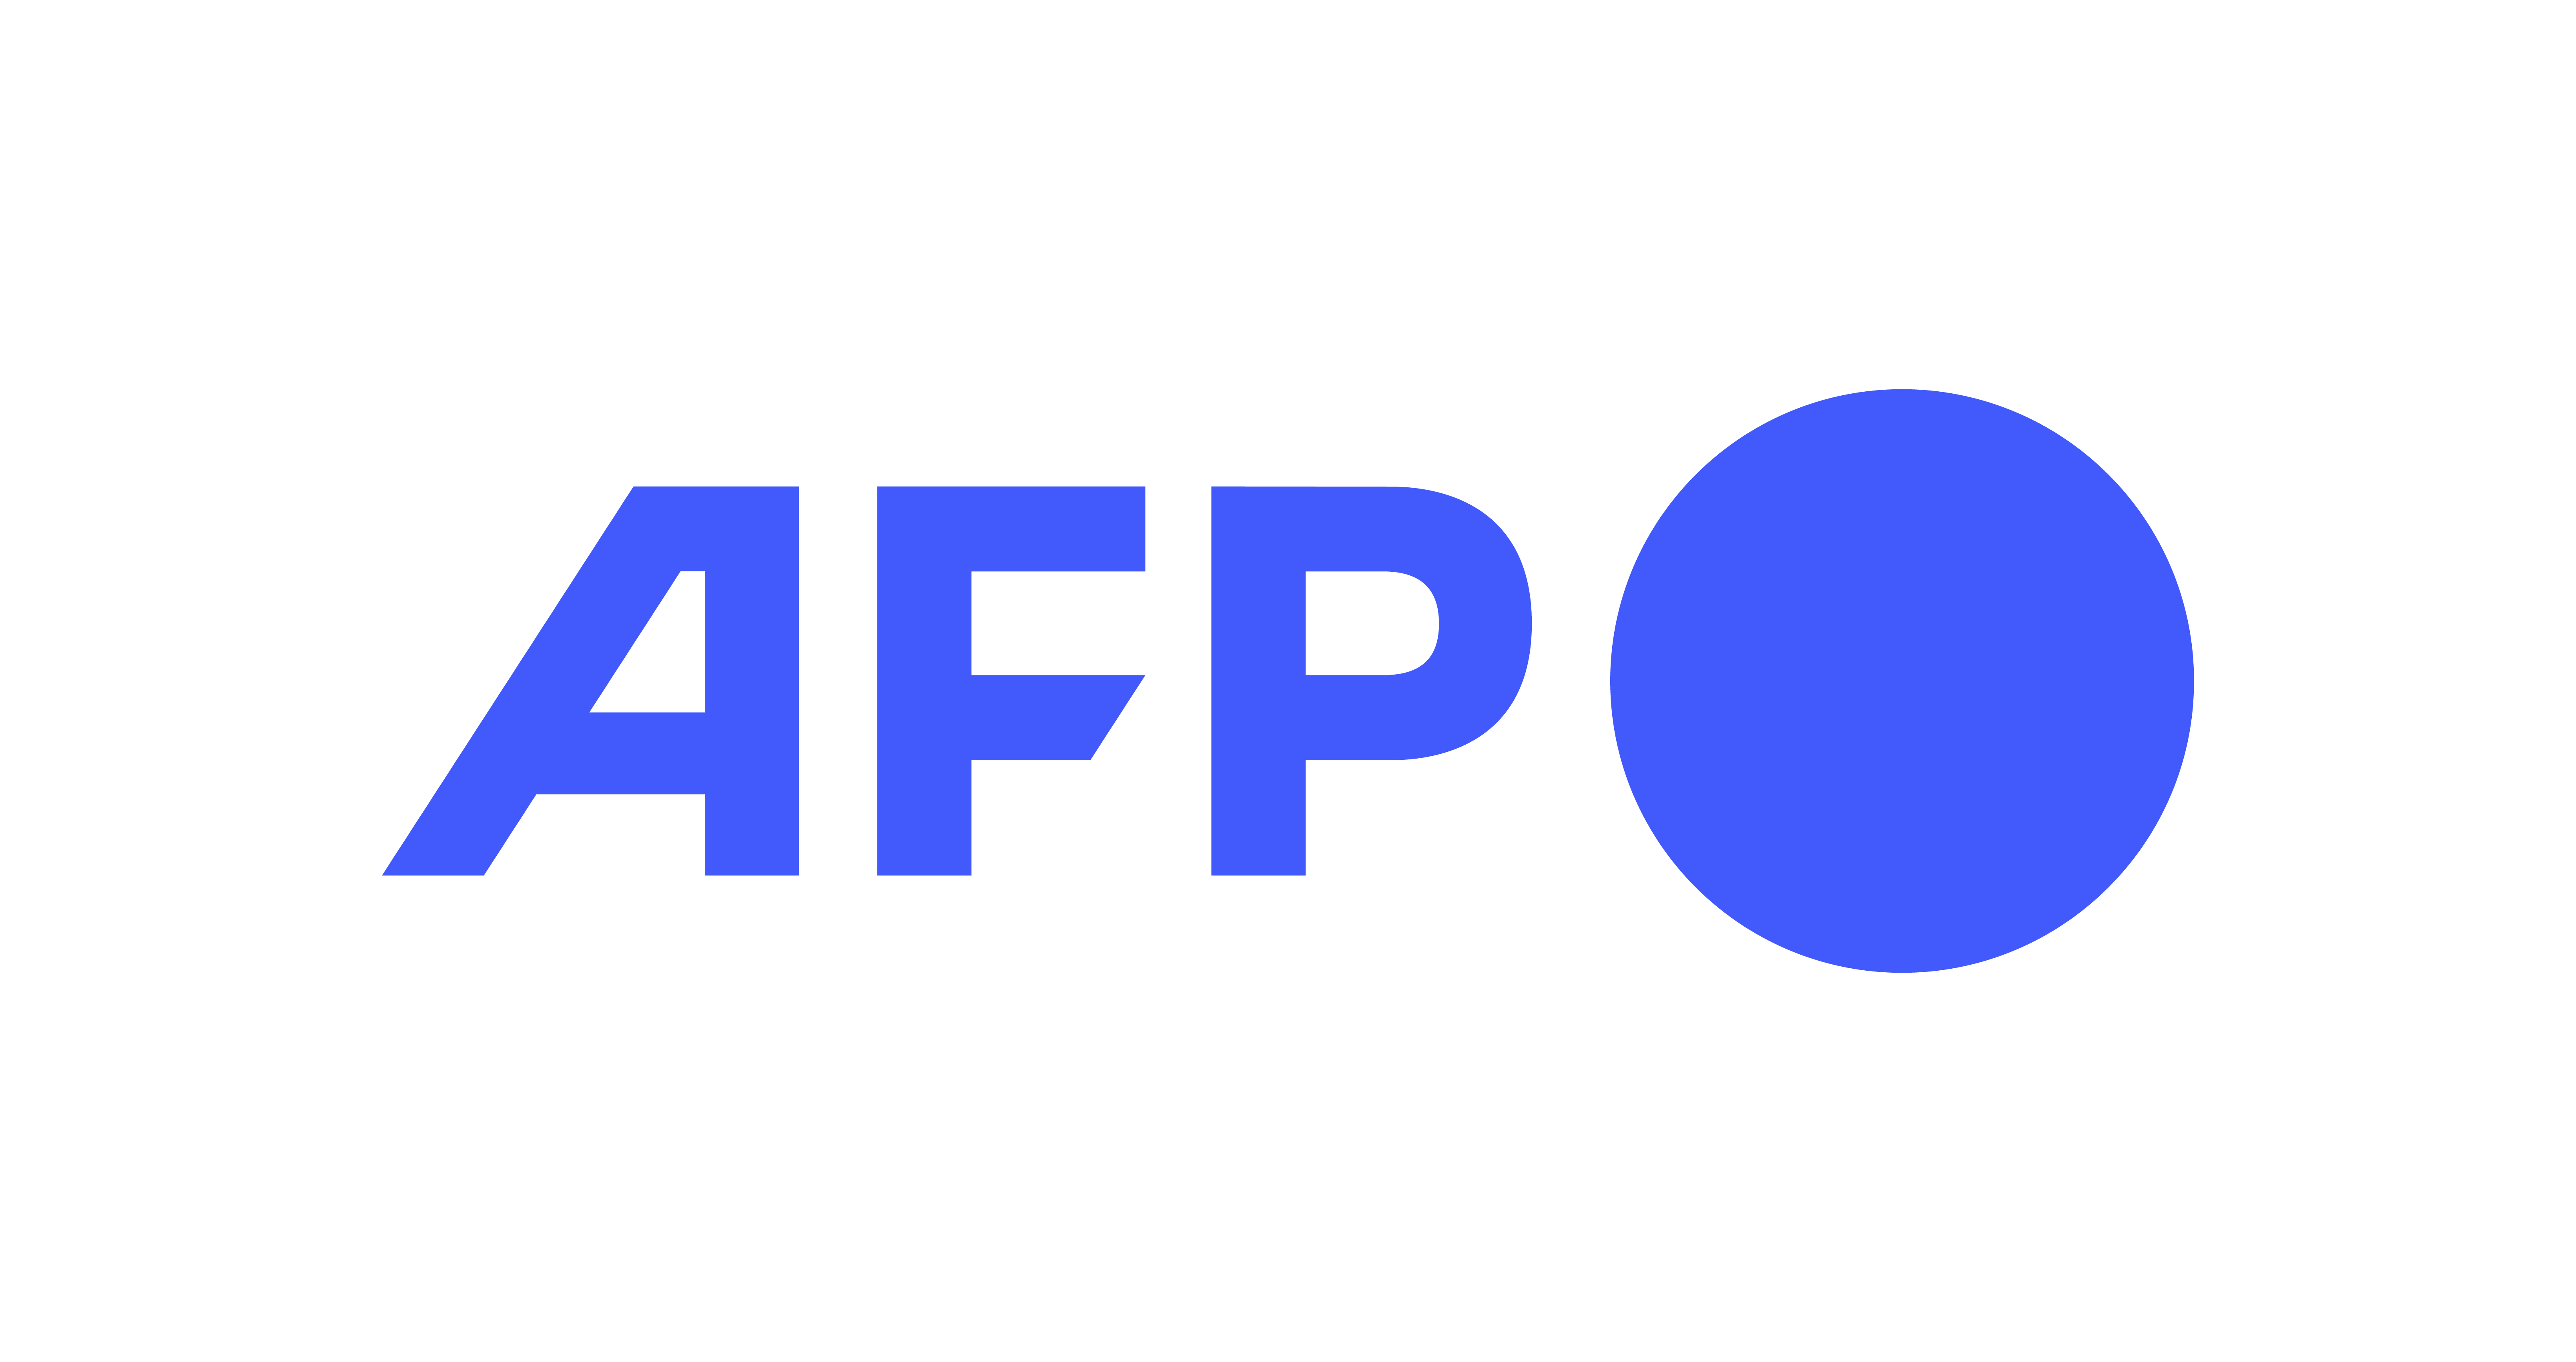 Afp Logotype Statique Bleu Rvb